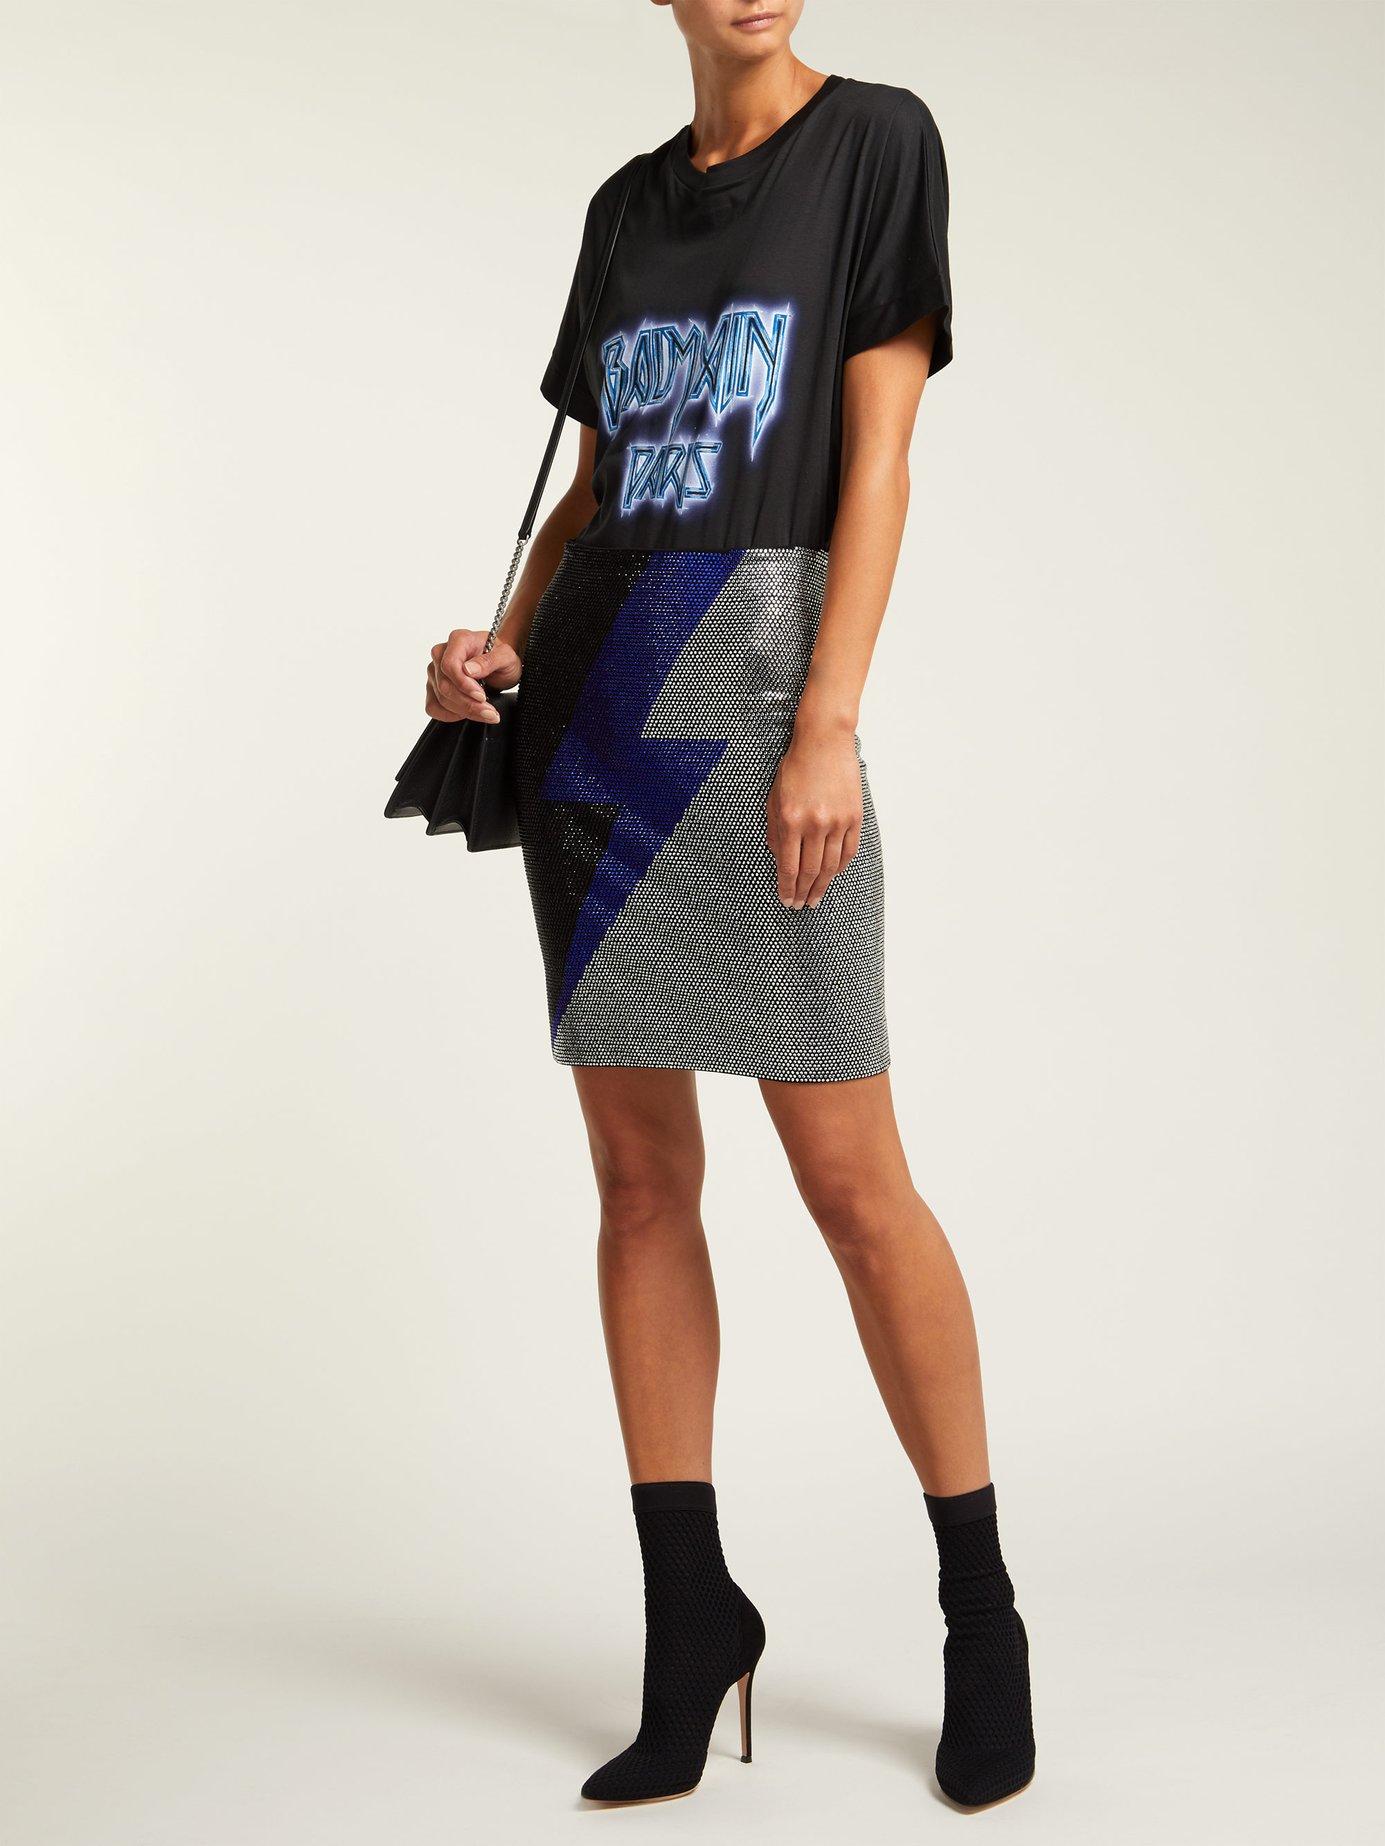 Oversized logo print cotton T-shirt by Balmain